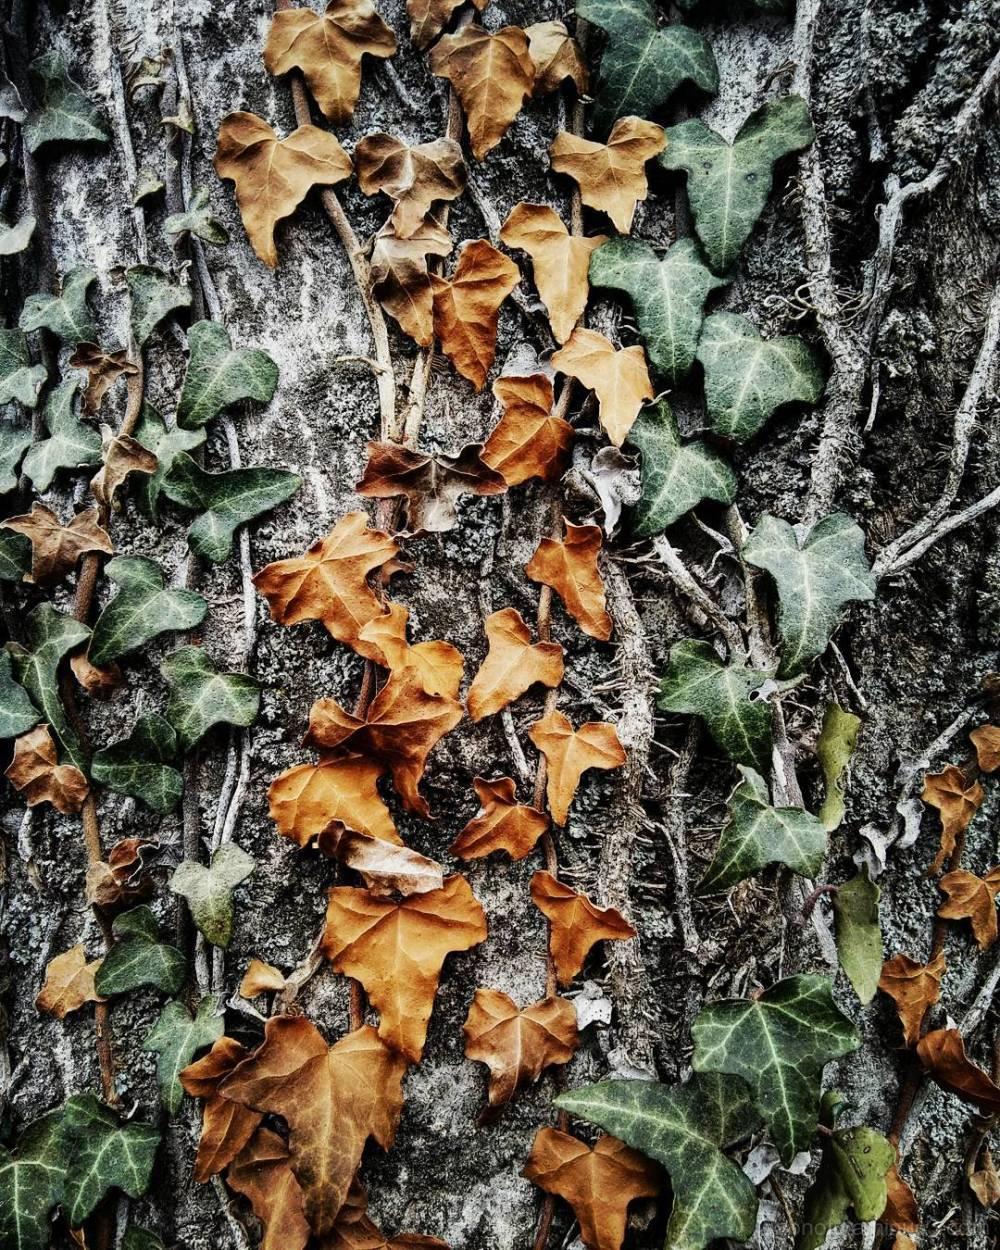 Slightly edited nature smartphotography!